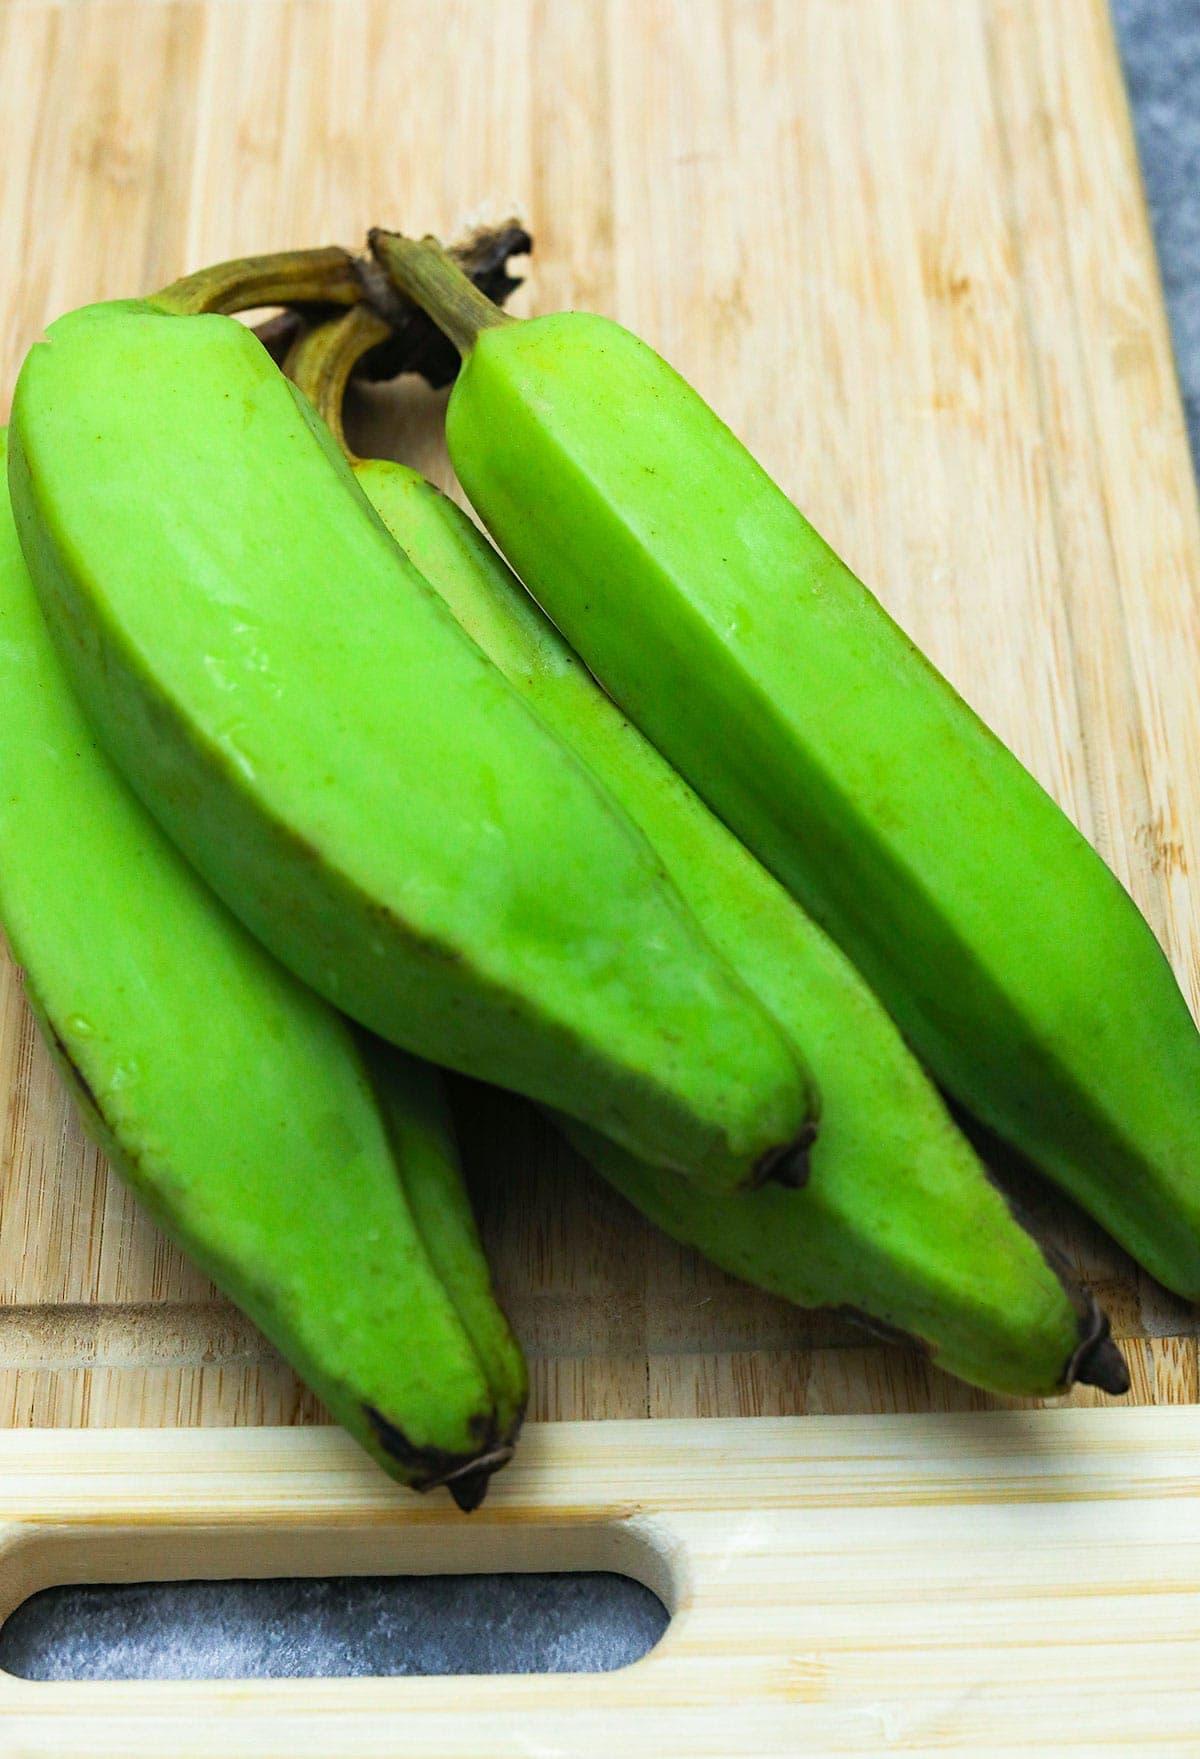 green bananas on cutting board